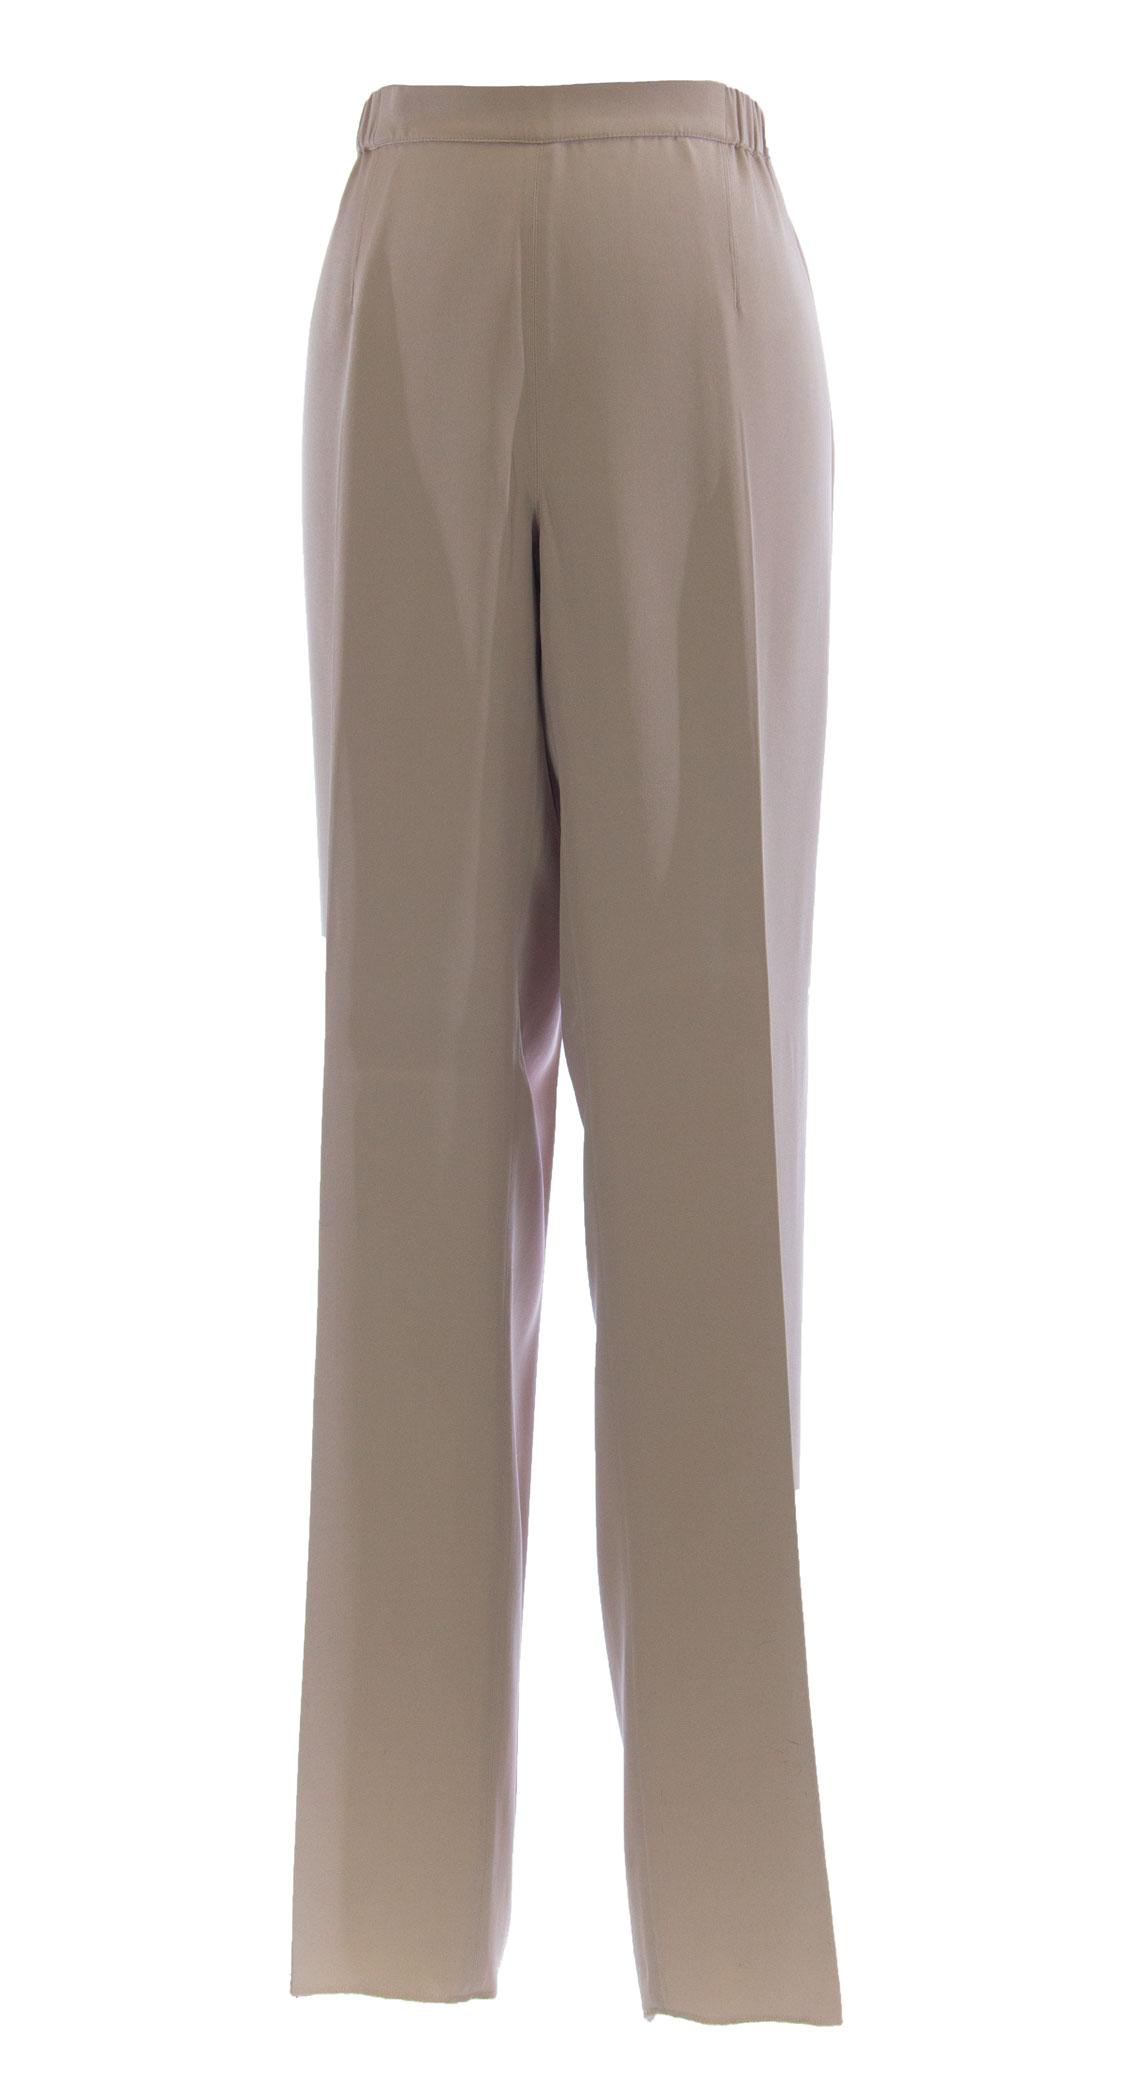 MARINA RINALDI by MaxMara Baritono Beige Unhemmed Dress Pants  14W   23